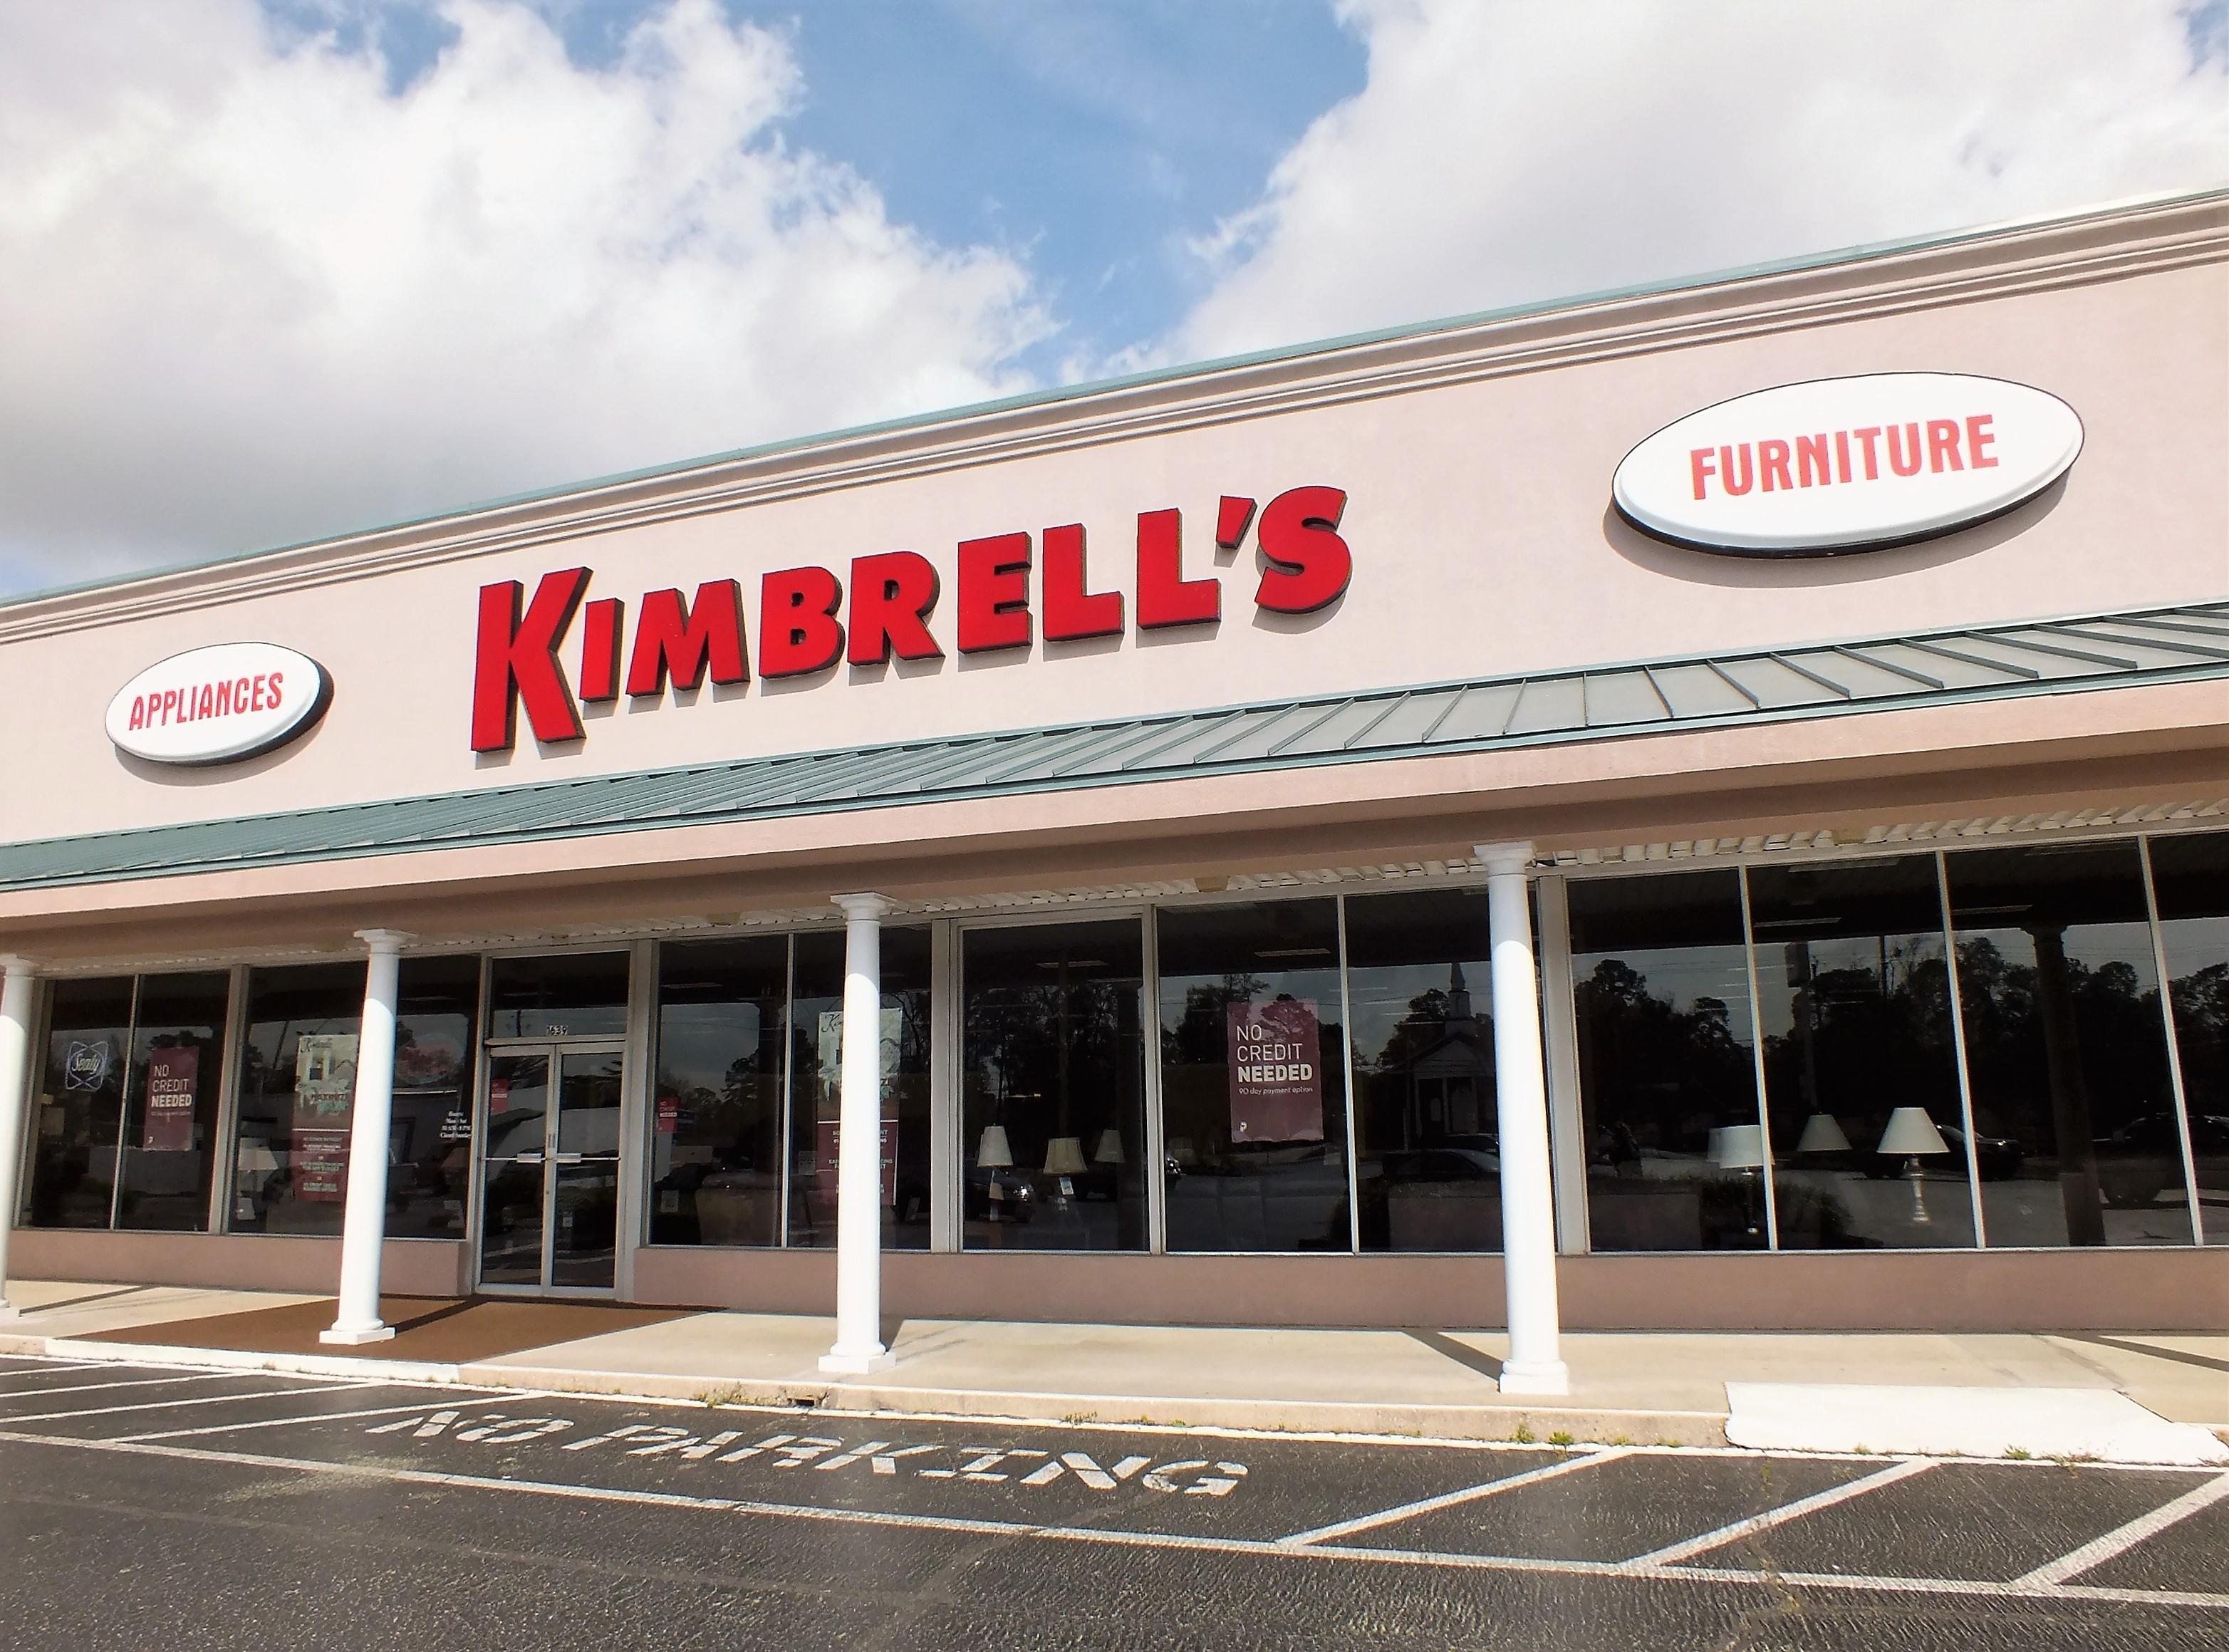 Kimbrell's Furniture image 0